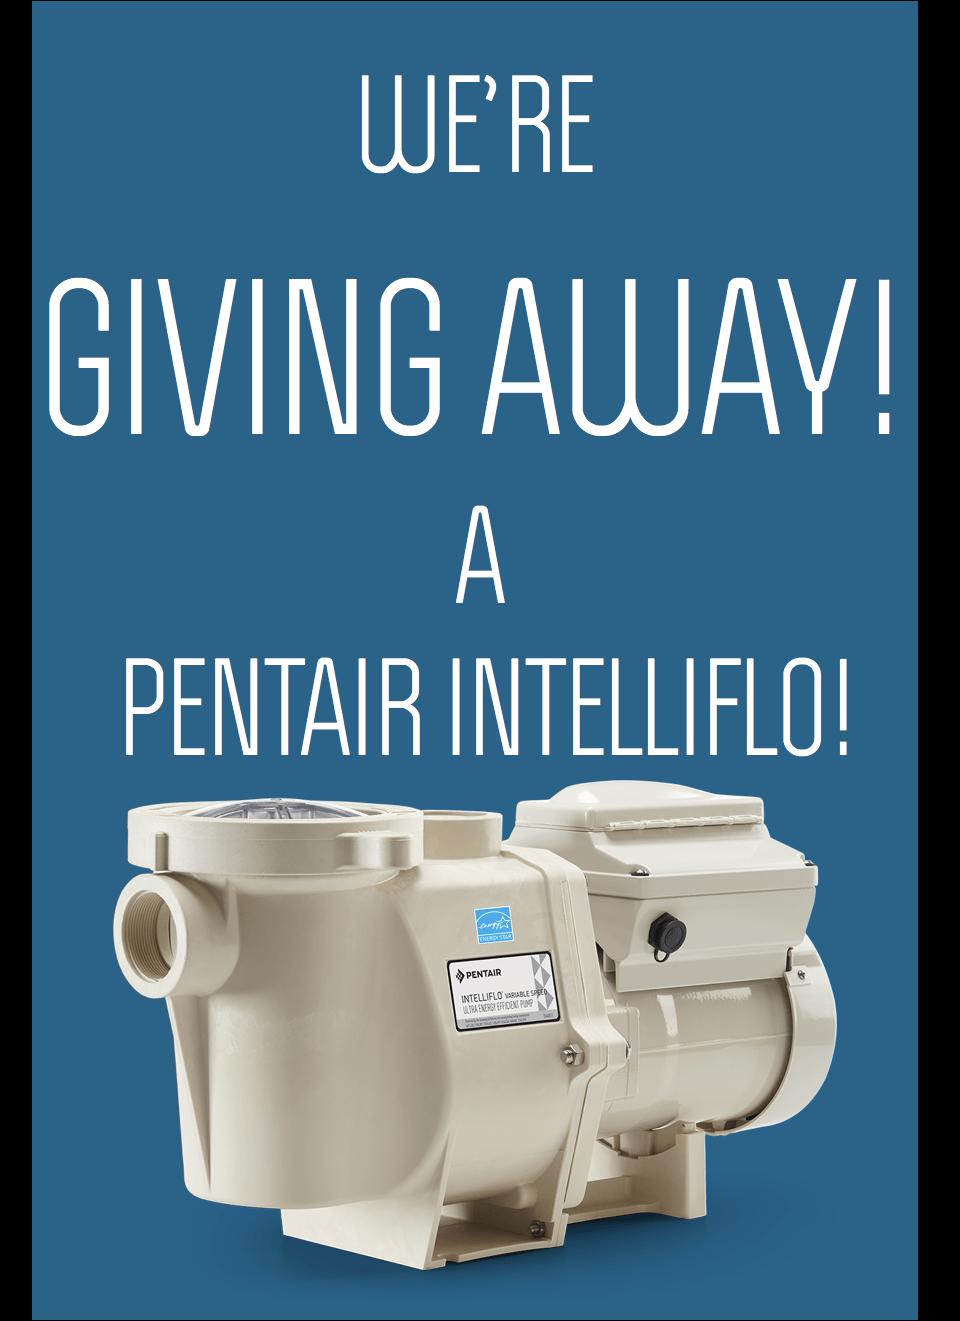 Pentair Intelliflo Giveaway Banner